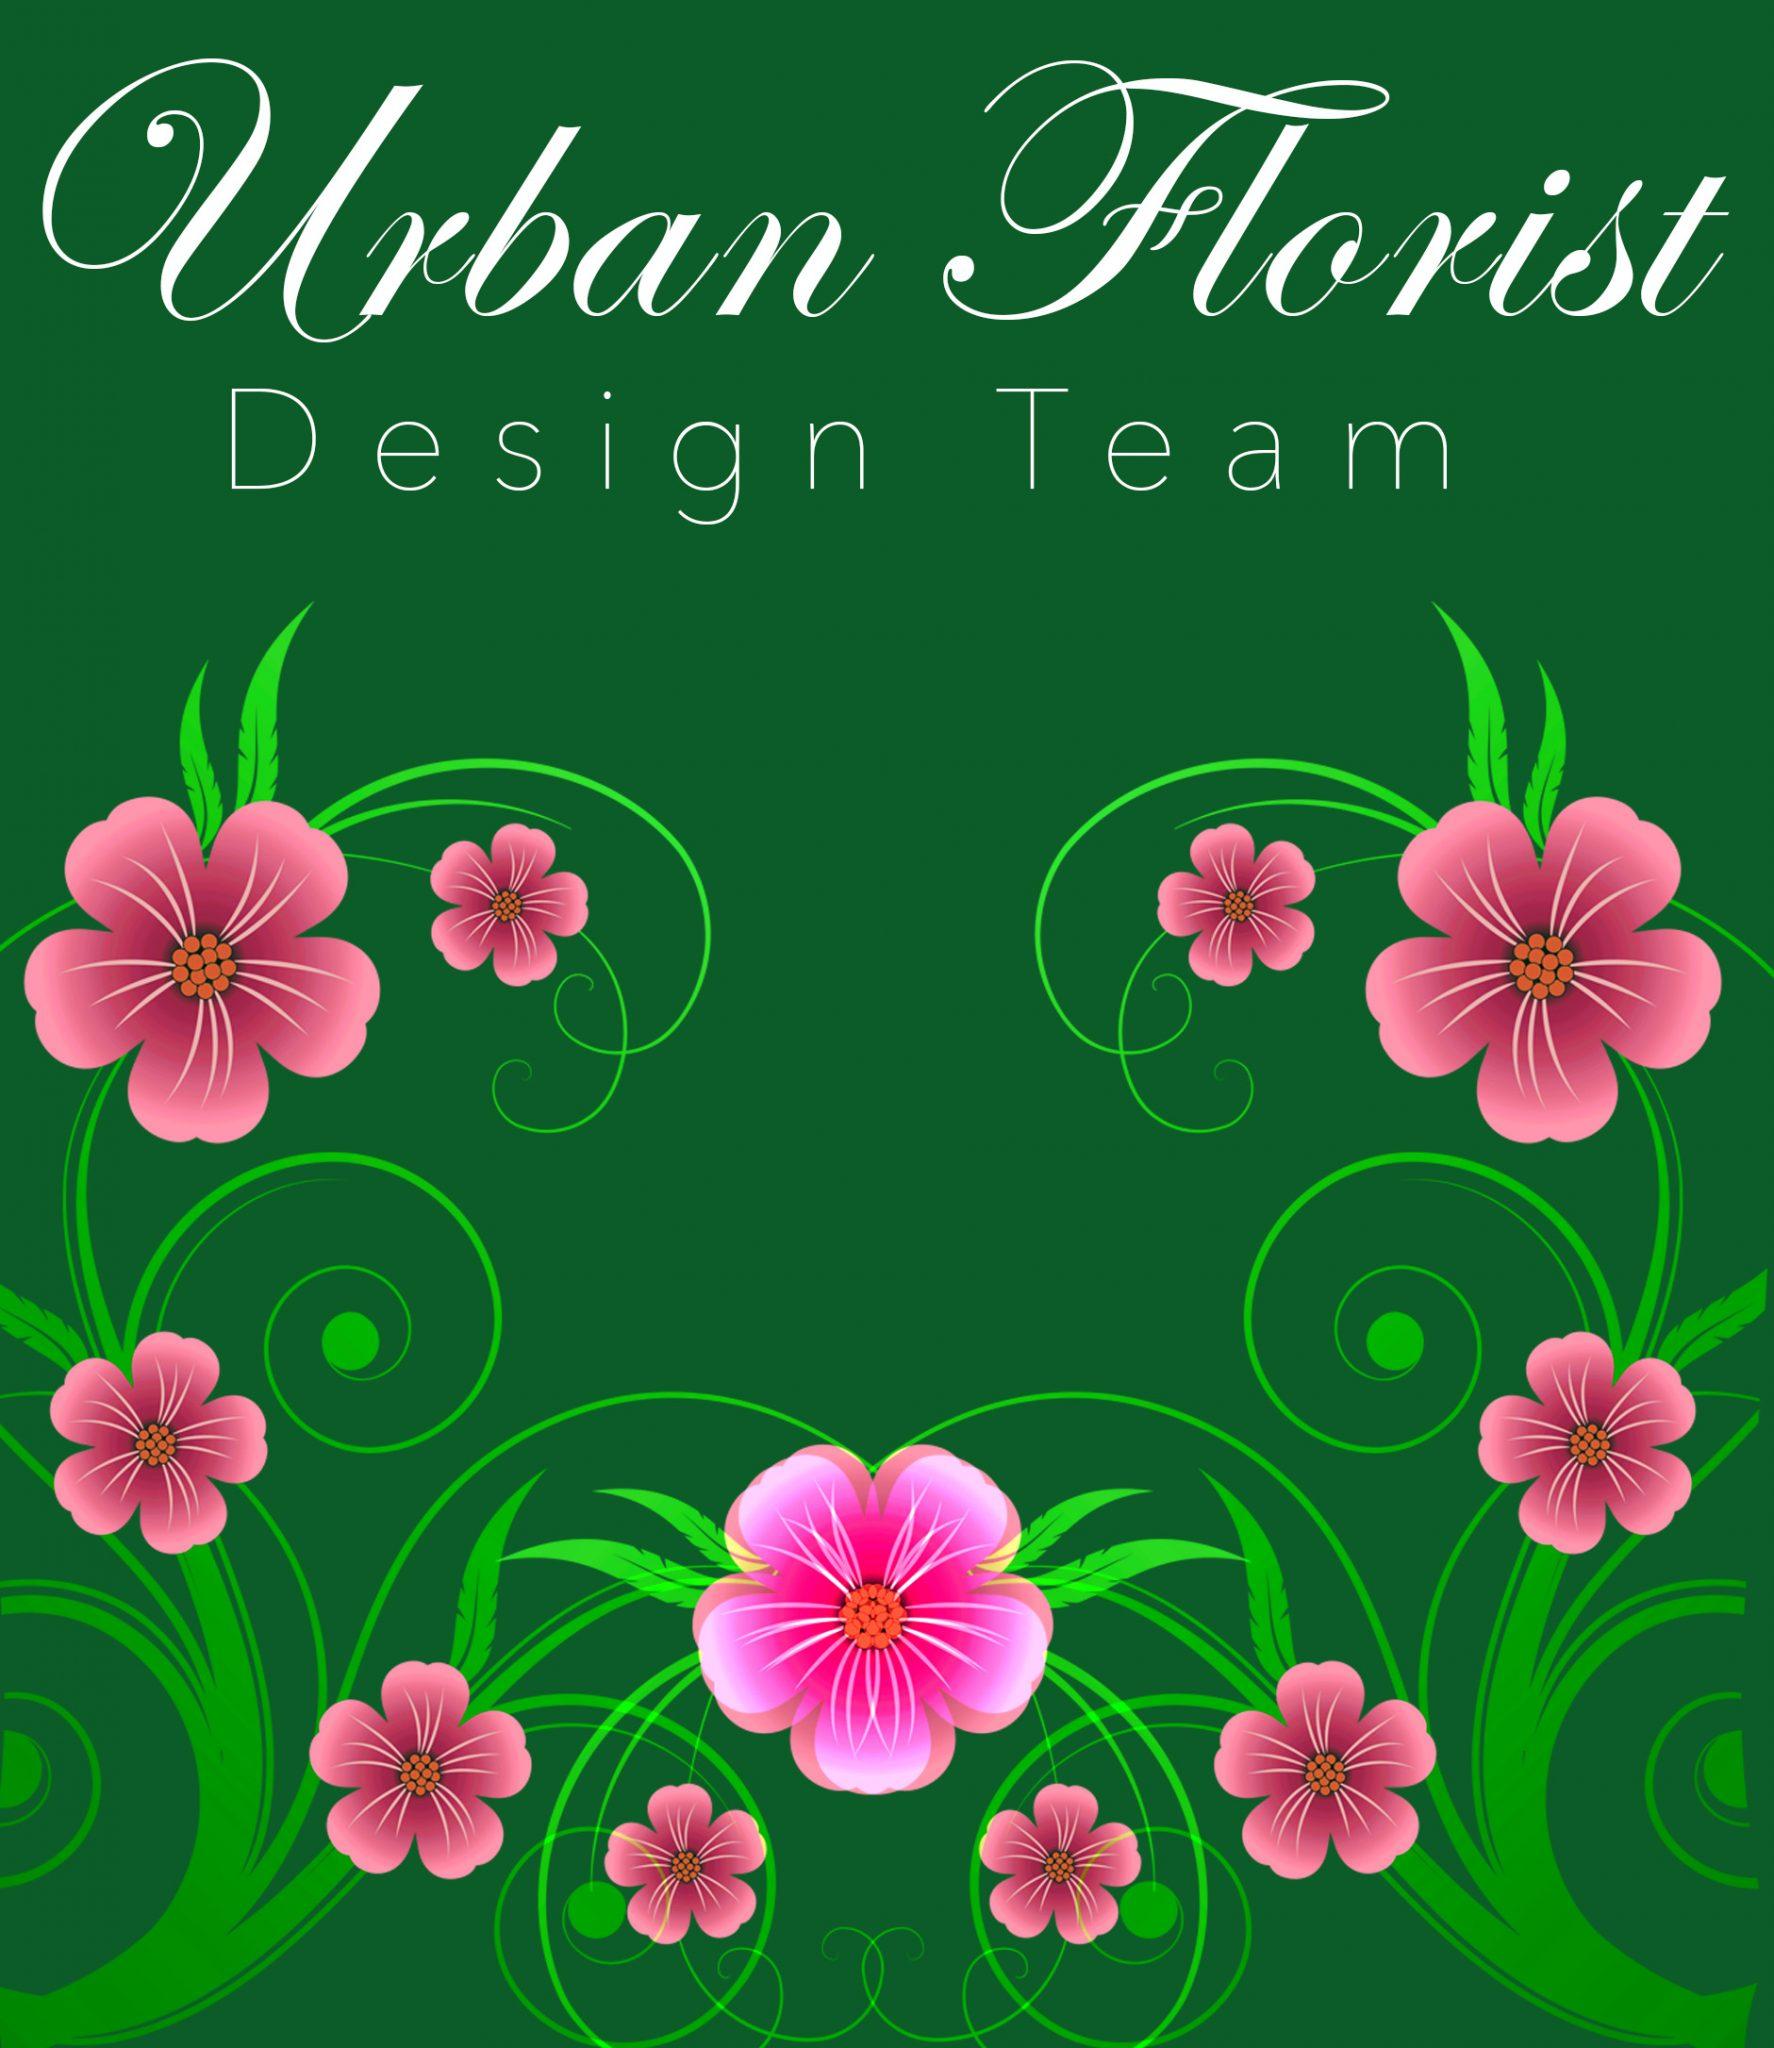 Urban Florist Team